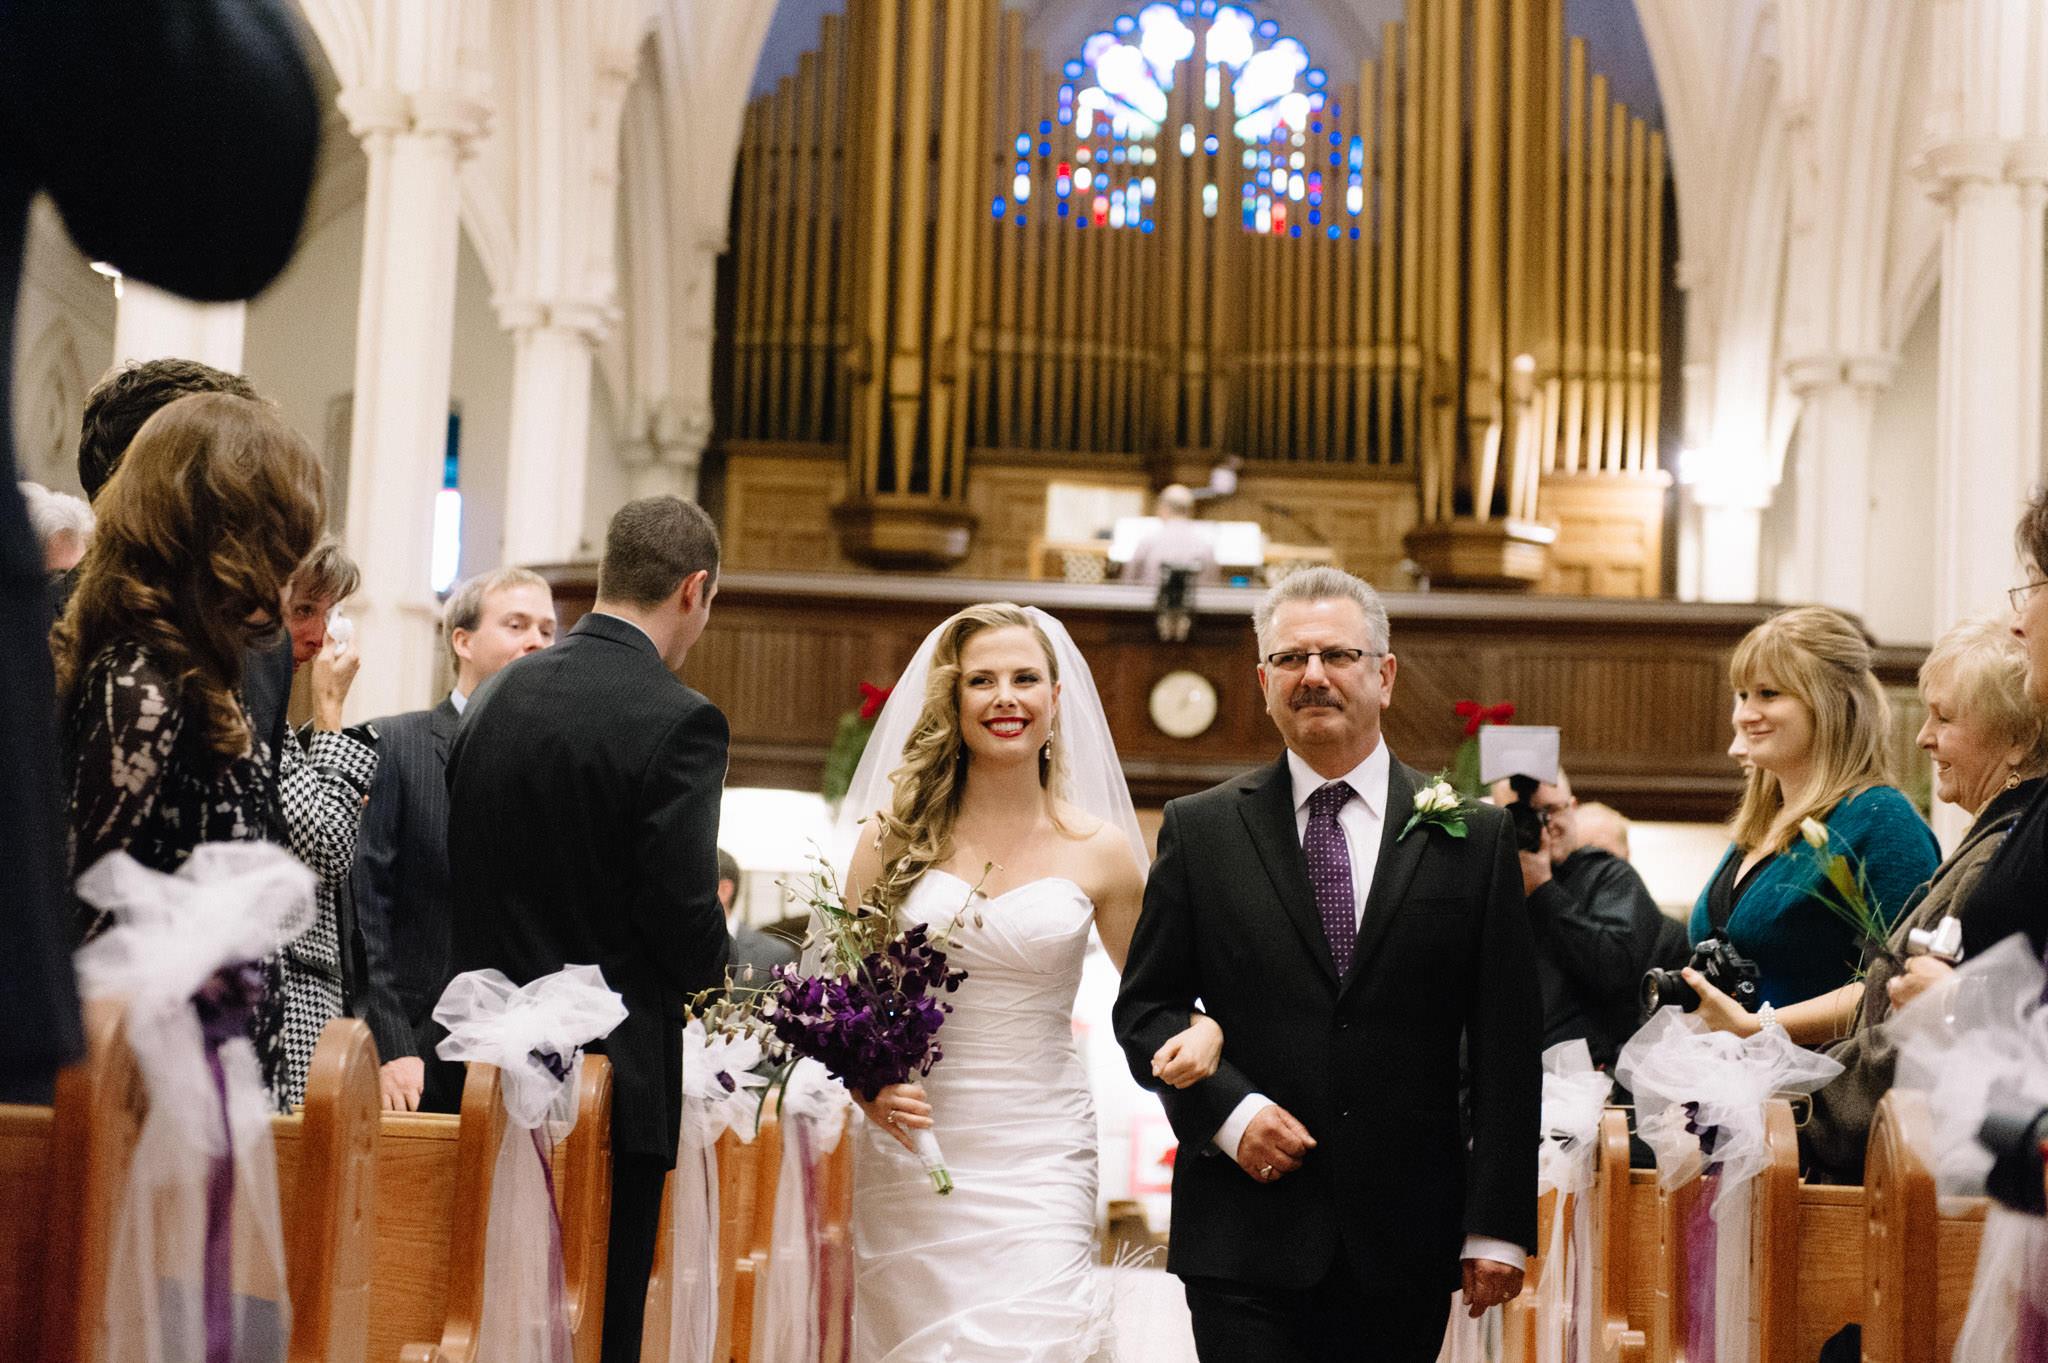 Toronto Saint Basil's Church wedding